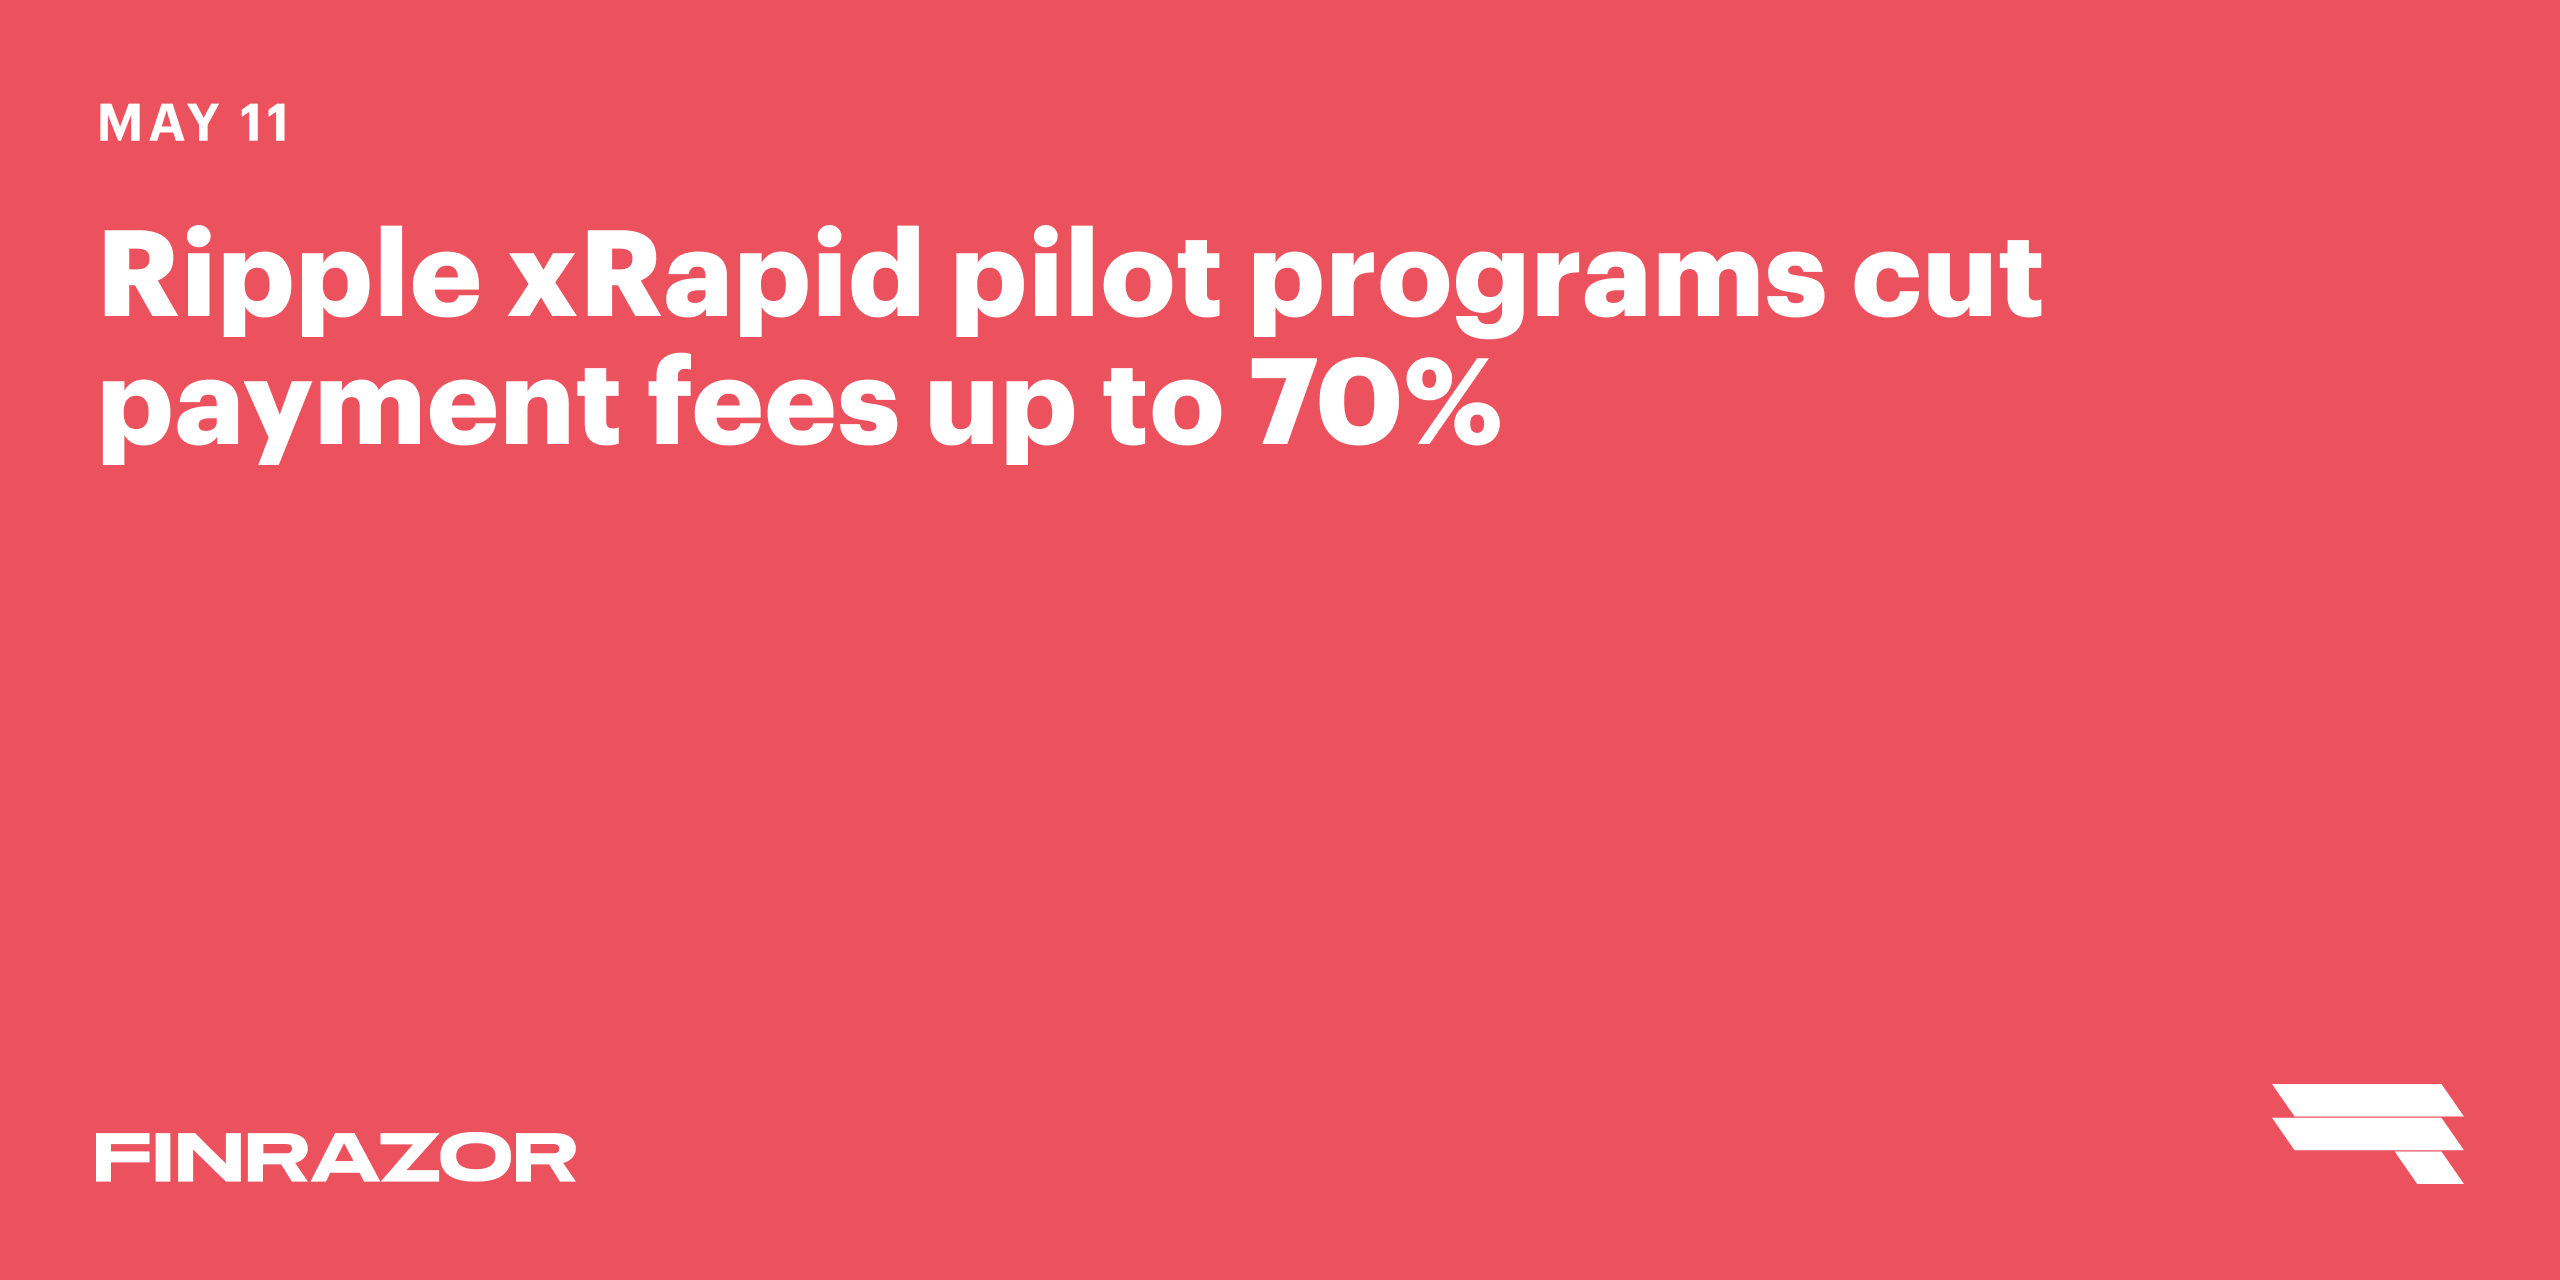 Ripple xPaid pilot